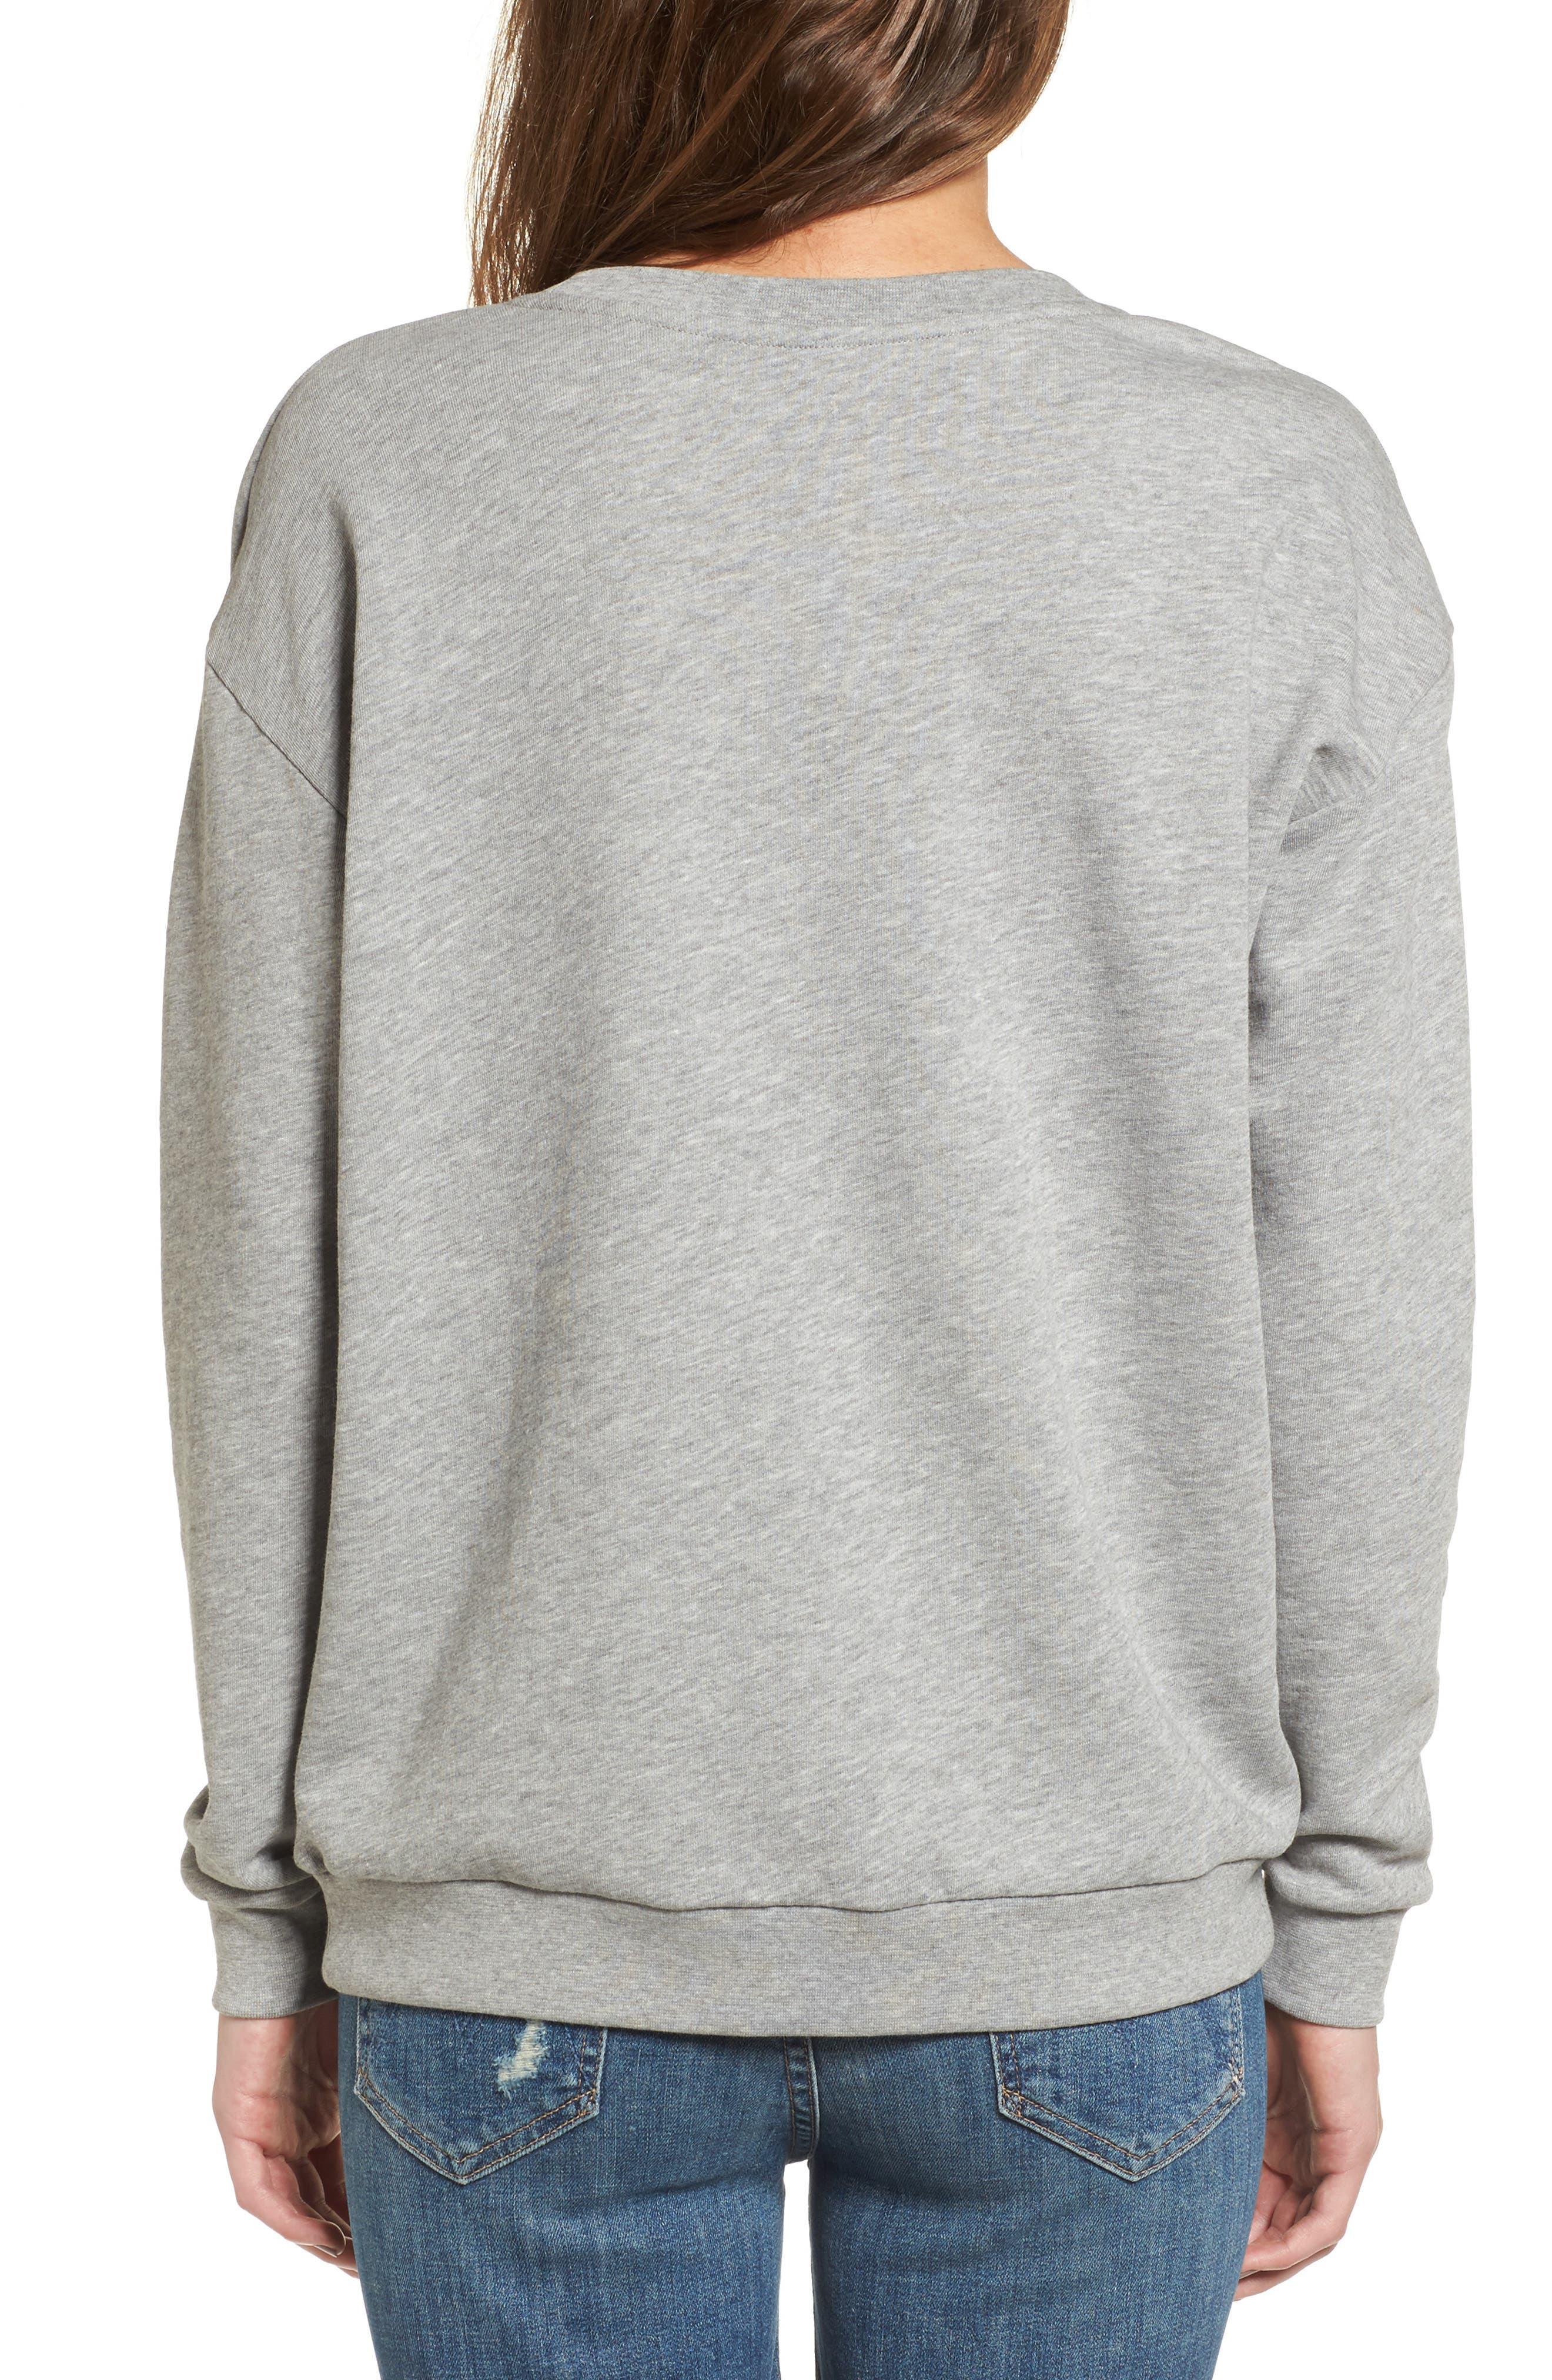 Friday I'm In Love Sweatshirt,                             Alternate thumbnail 2, color,                             020